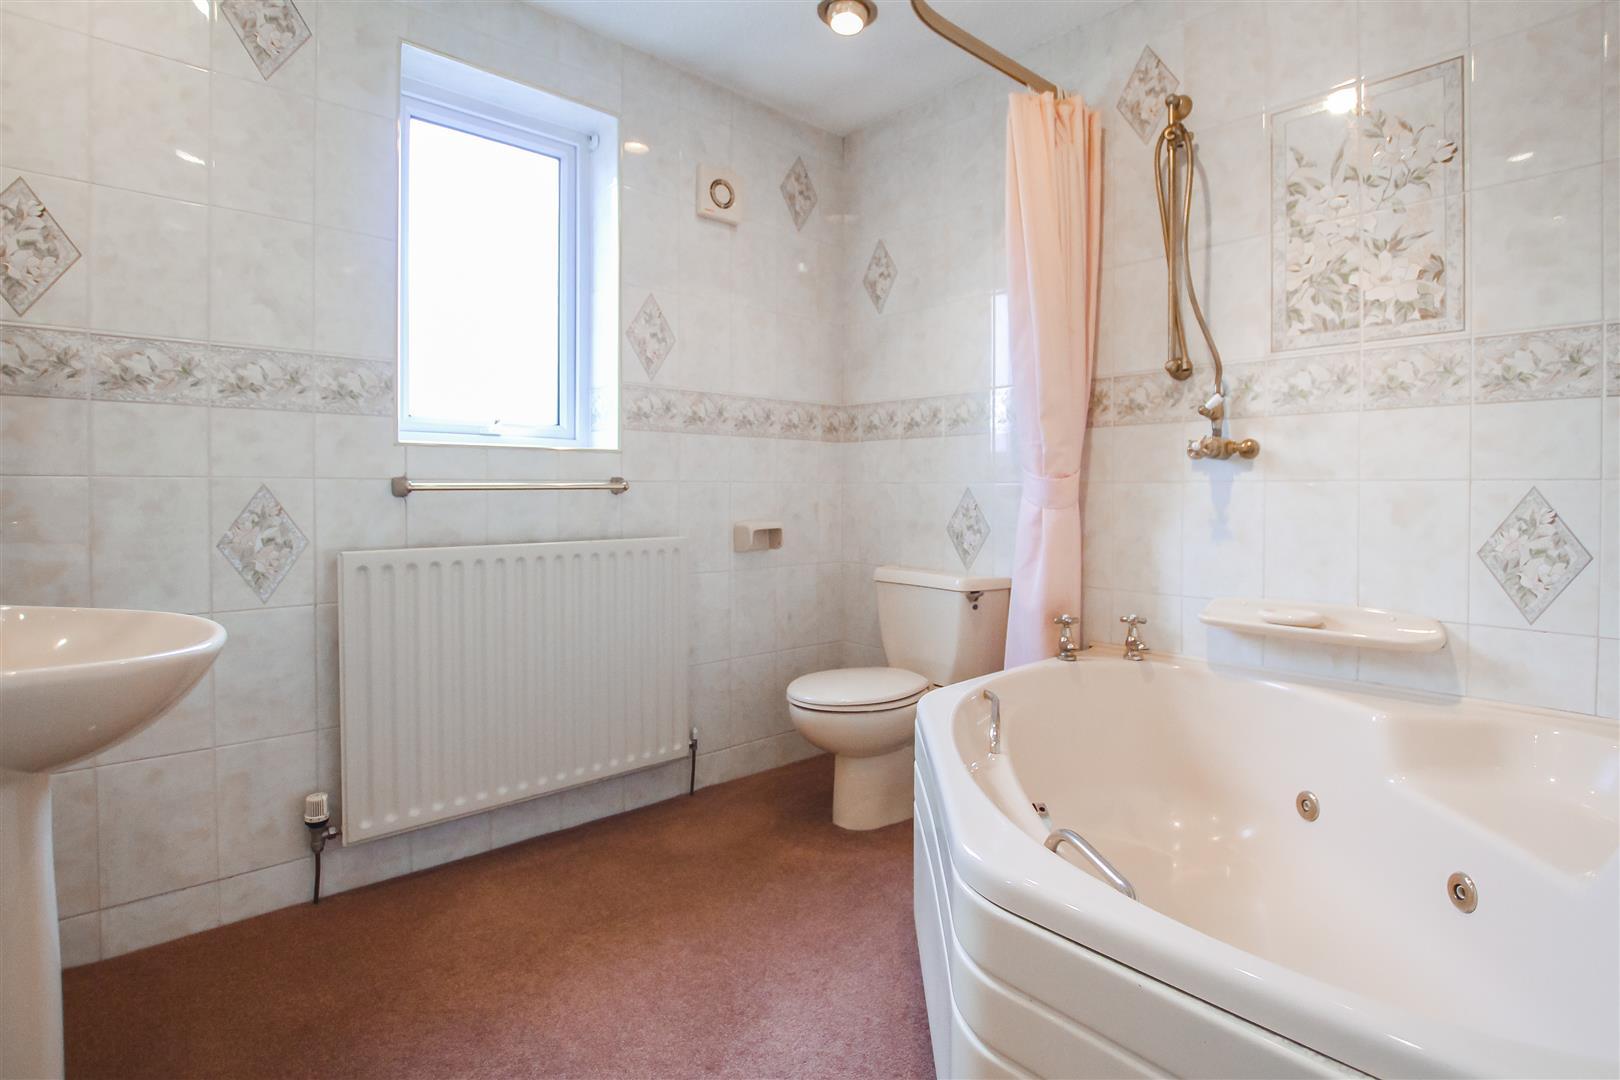 5 Bedroom Detached House For Sale - Bathroom